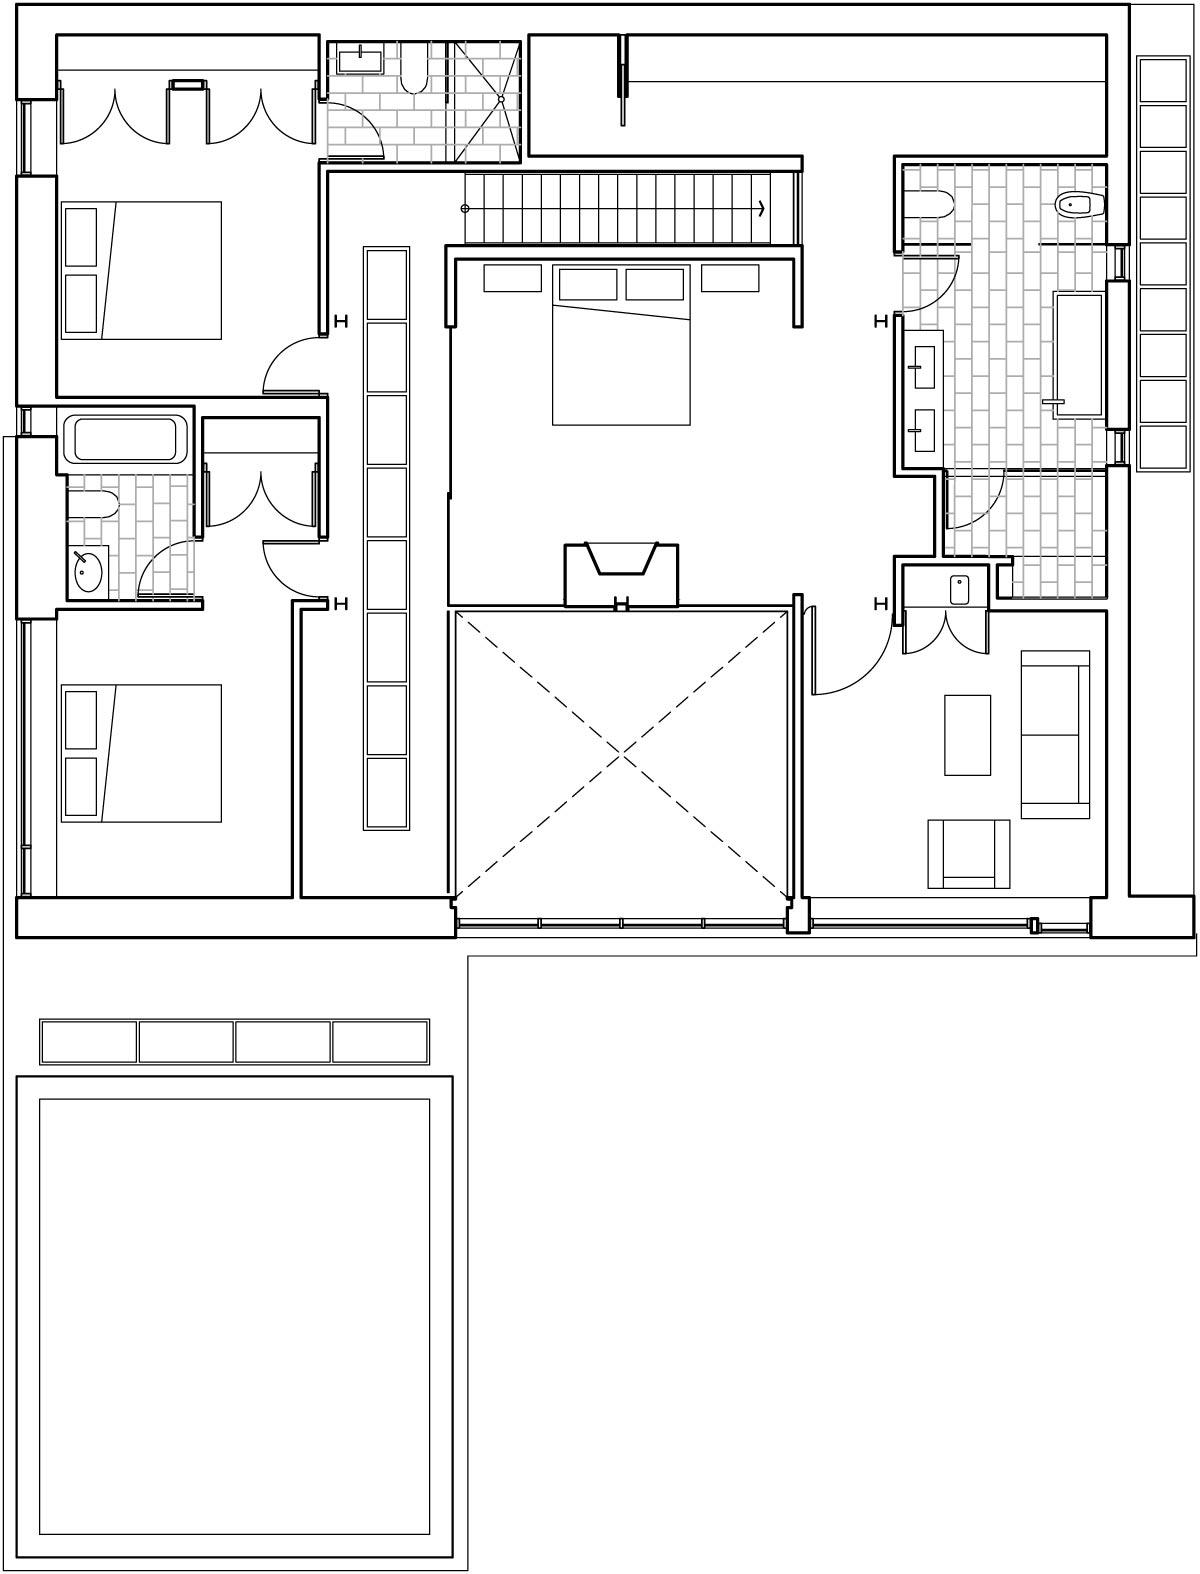 Bishop Street Residence, Toronto / Taylor Smyth Architects